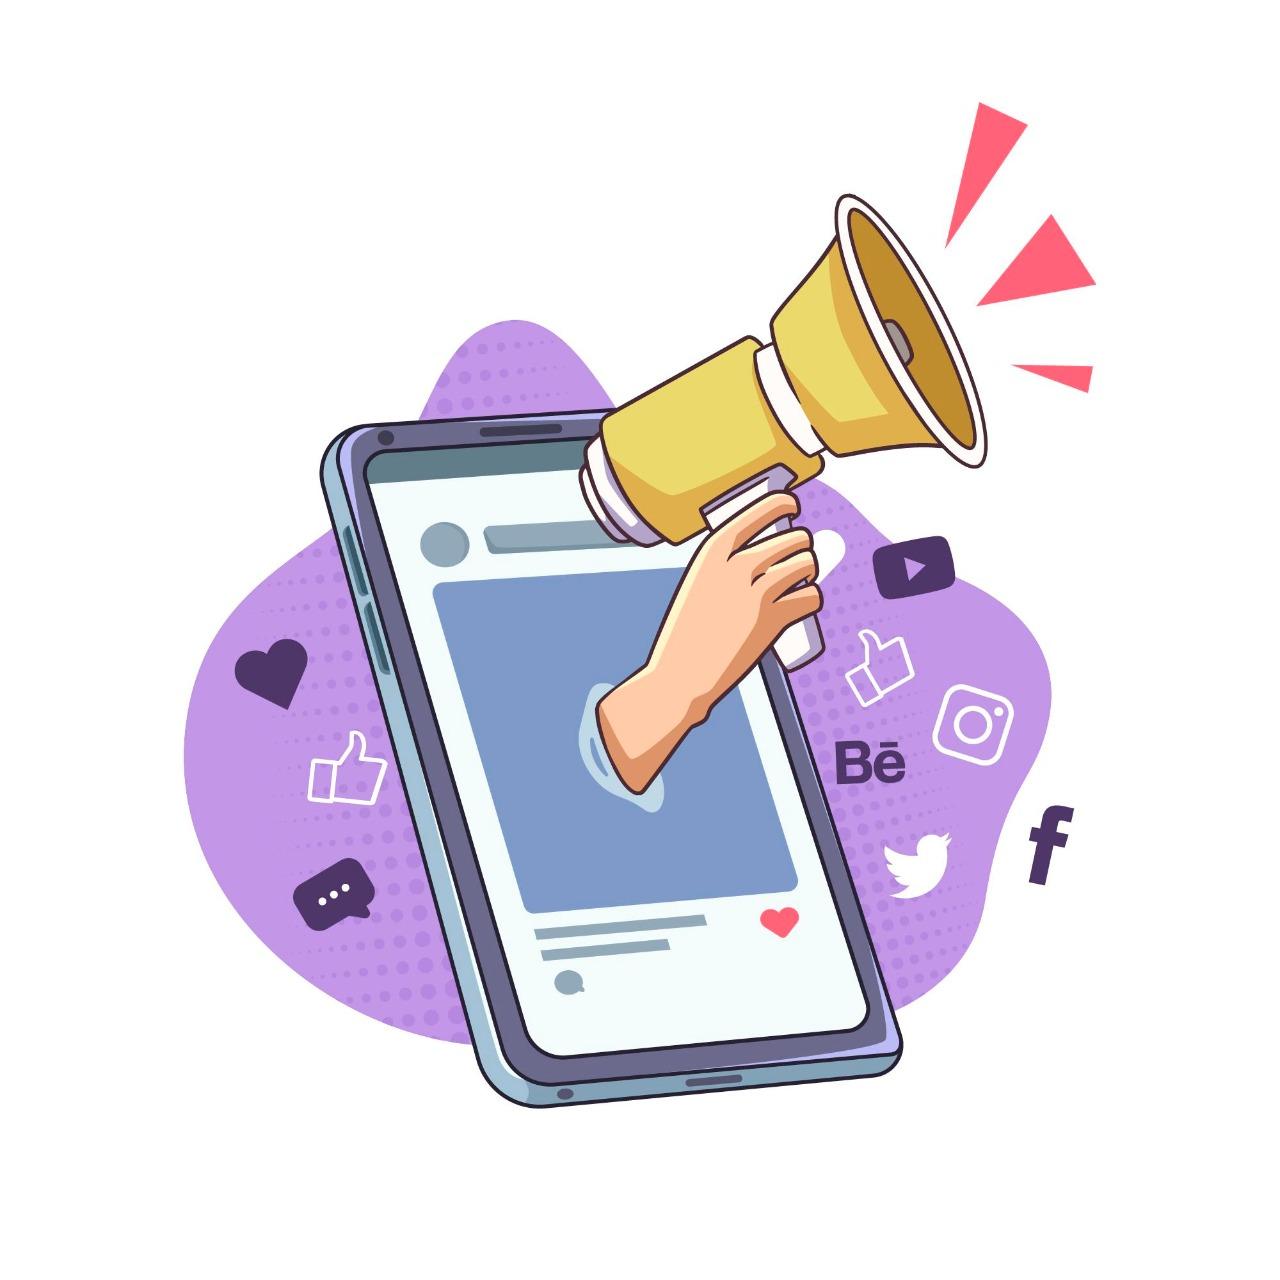 Jasa Buat Website Seo 4 Strategi Digital Marketing Untuk Tingkatkan Trafik Kunjungan